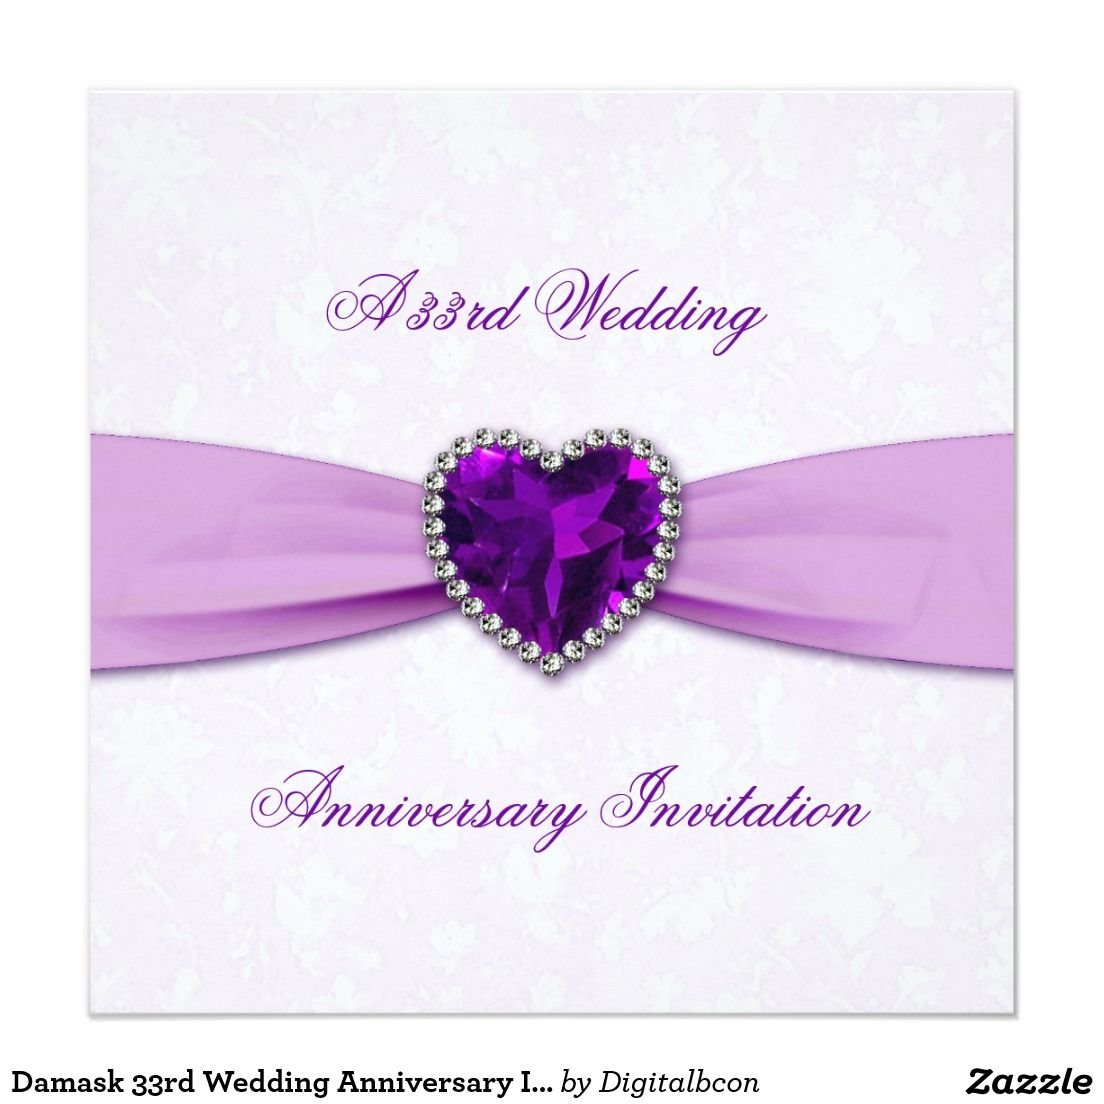 Damask 33rd Wedding Anniversary Invitation 33rd Wedding